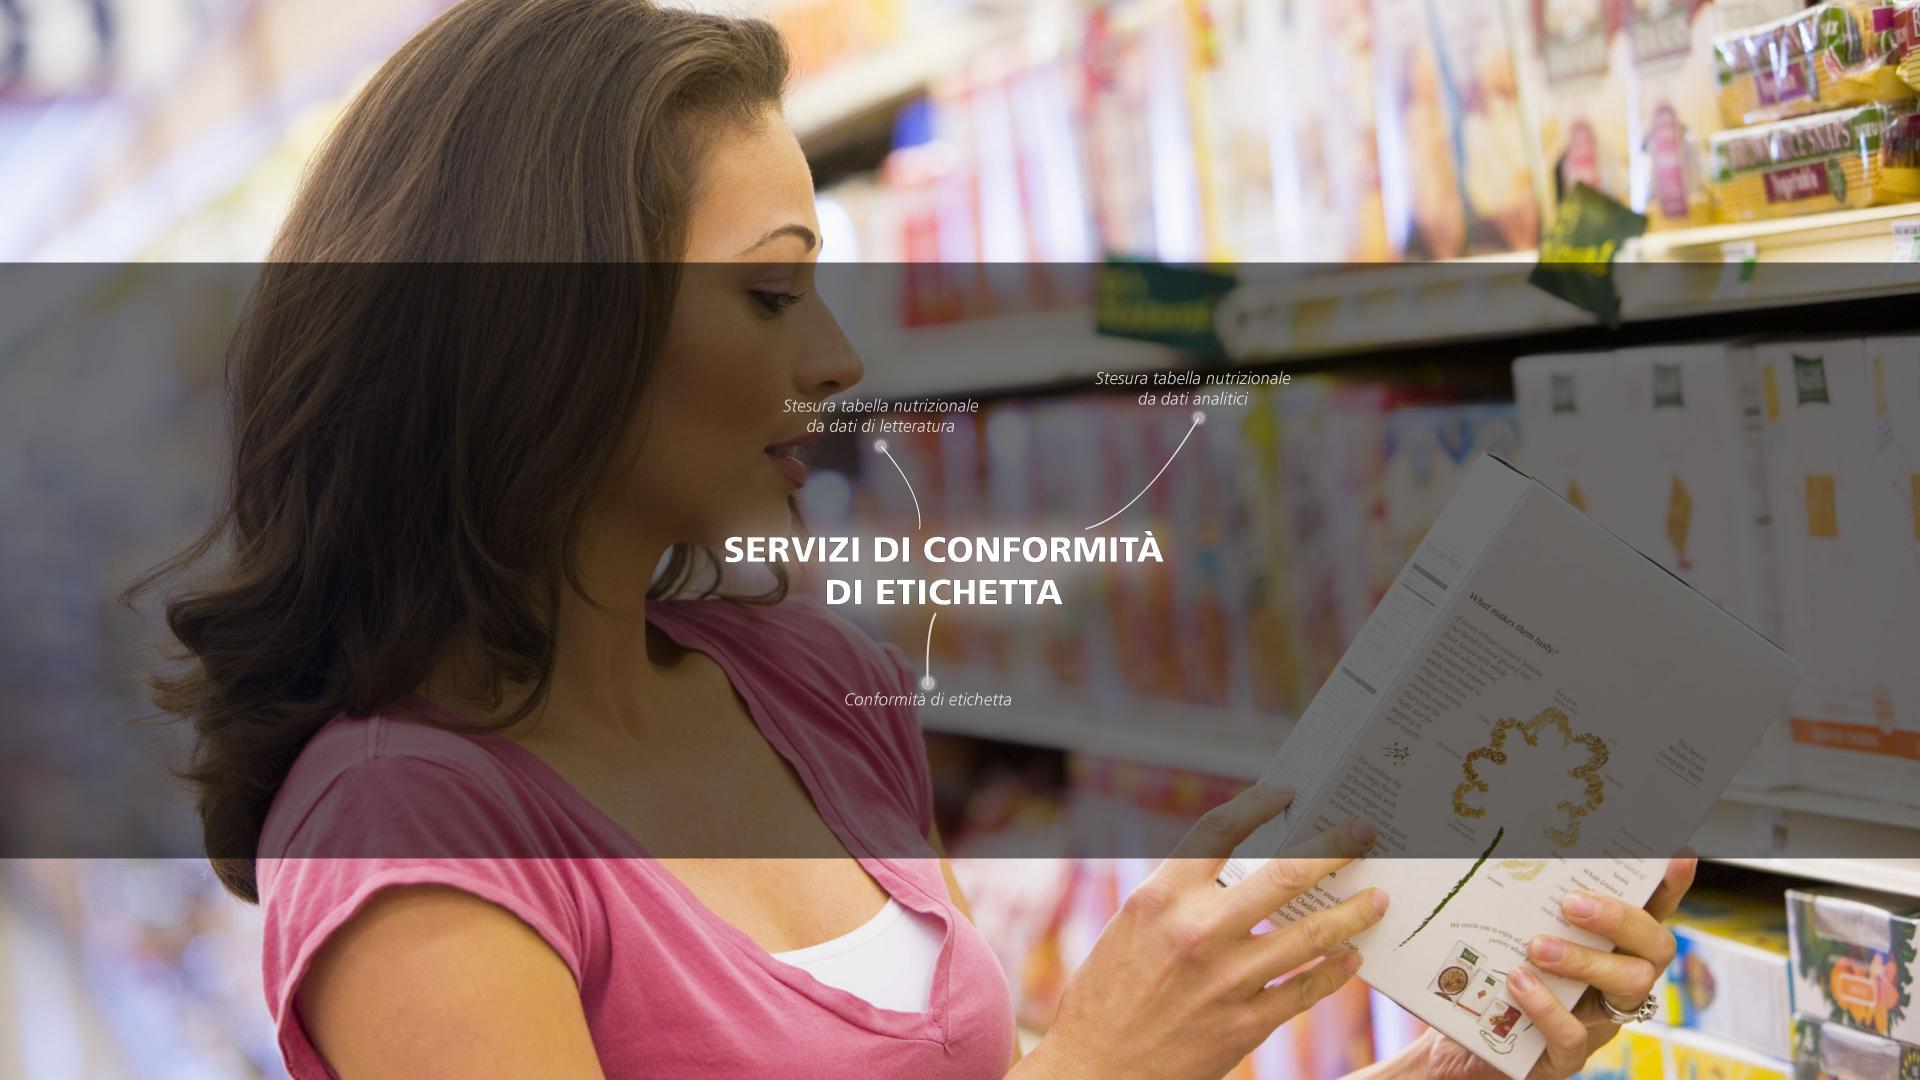 Mérieux NutriSciences-labeling and Regulatory-Stesura tabella nutrizionale da dati di letteratura-ITA